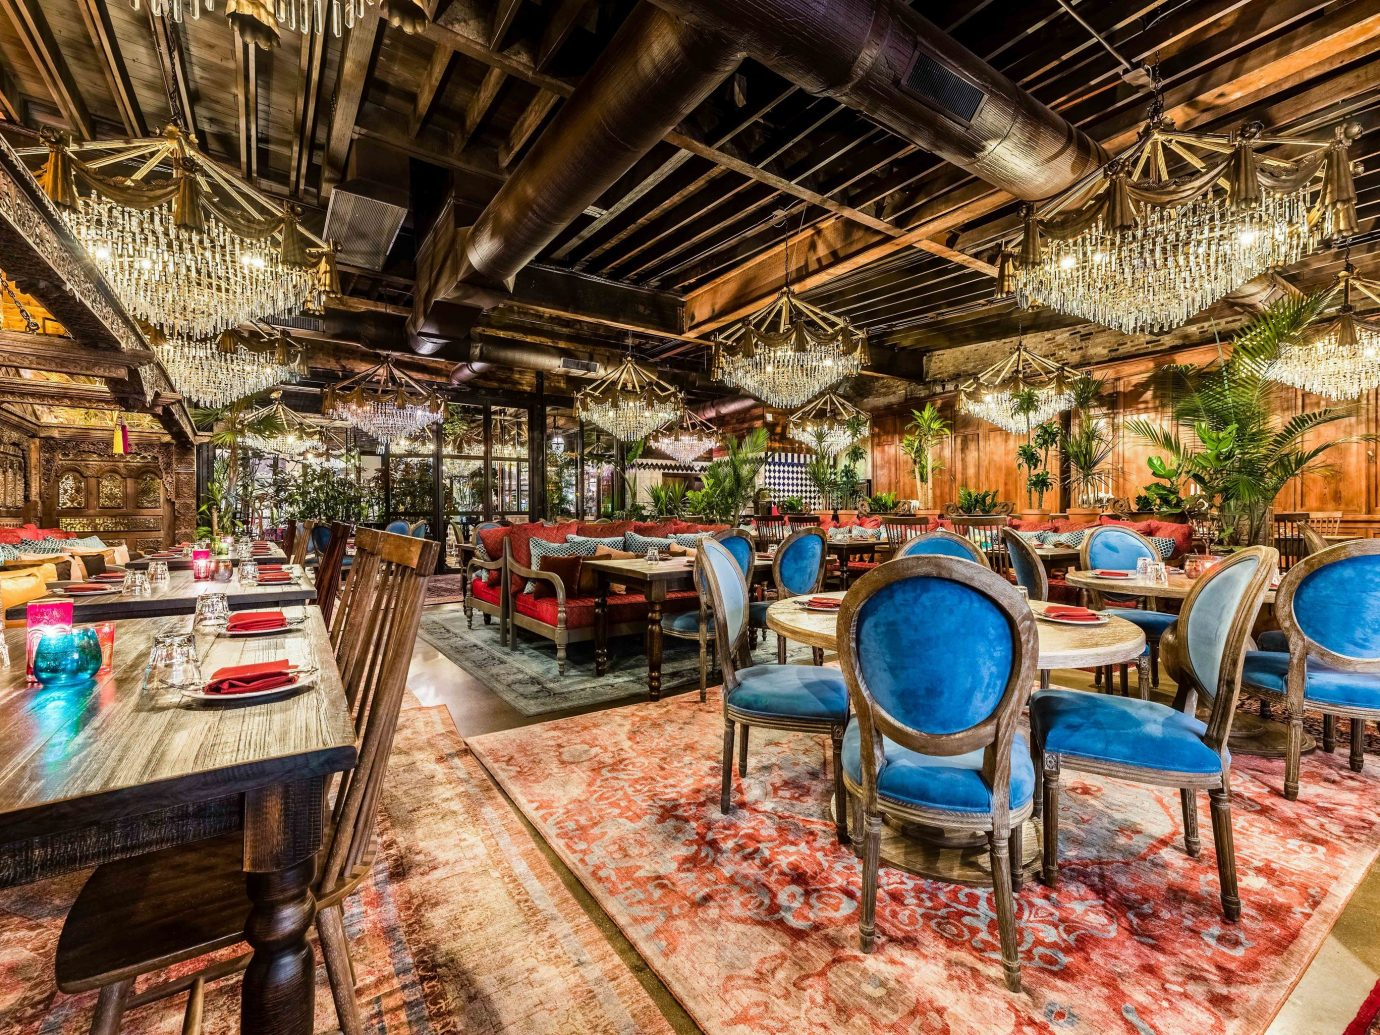 Arts + Culture Food + Drink Hotels Weekend Getaways indoor chair restaurant interior design leisure furniture several